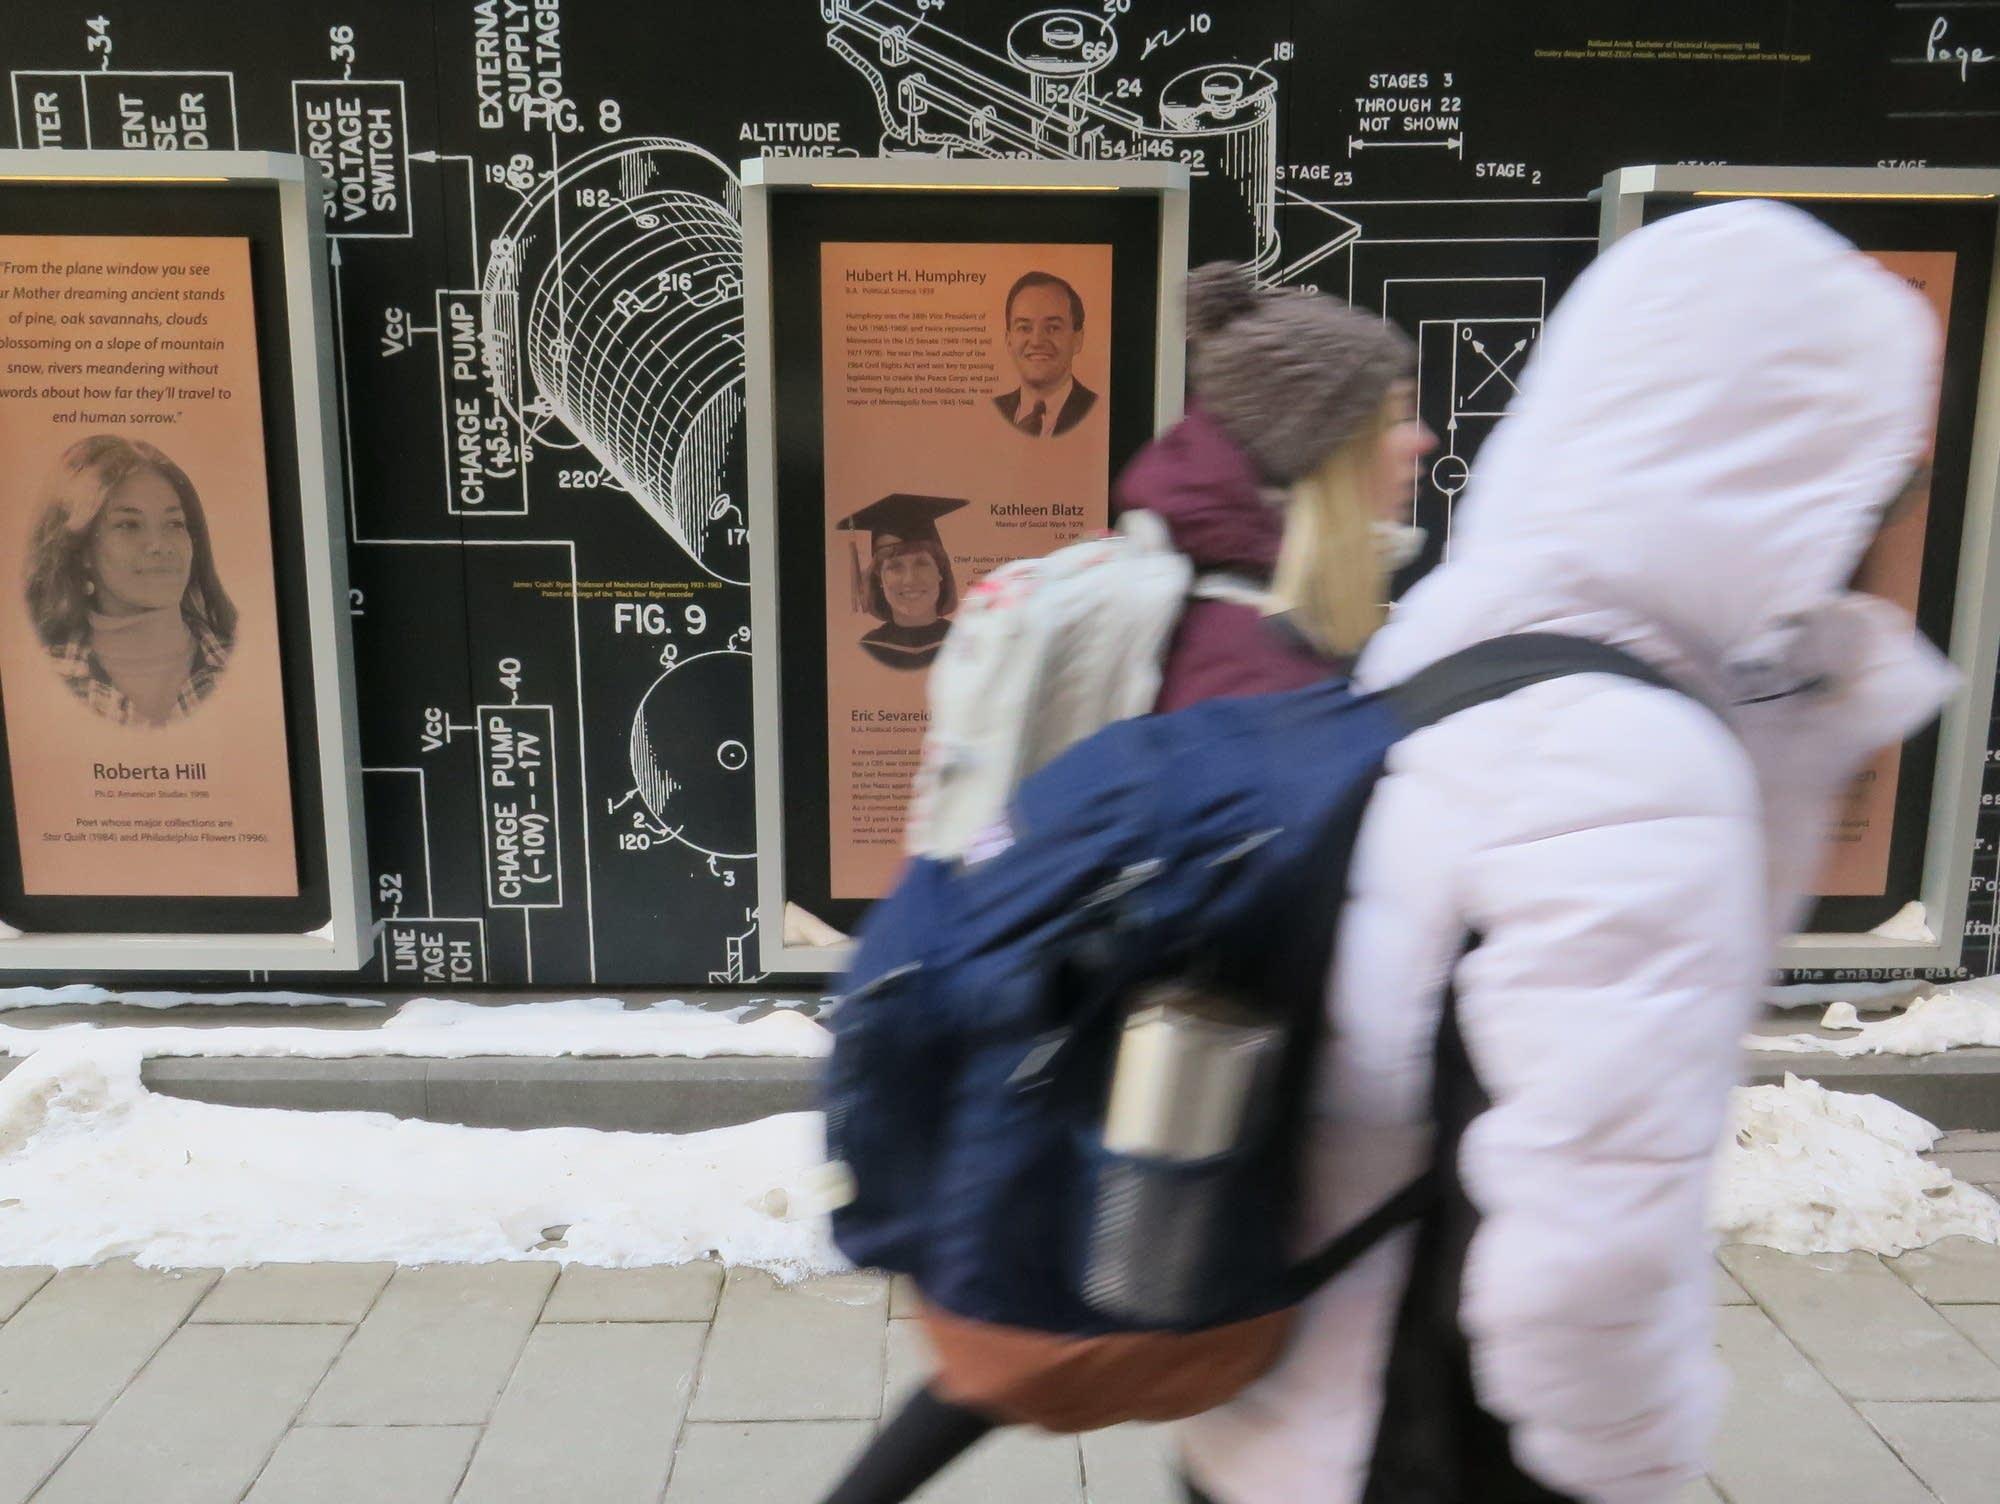 University of Minnesota's Scholars Walk